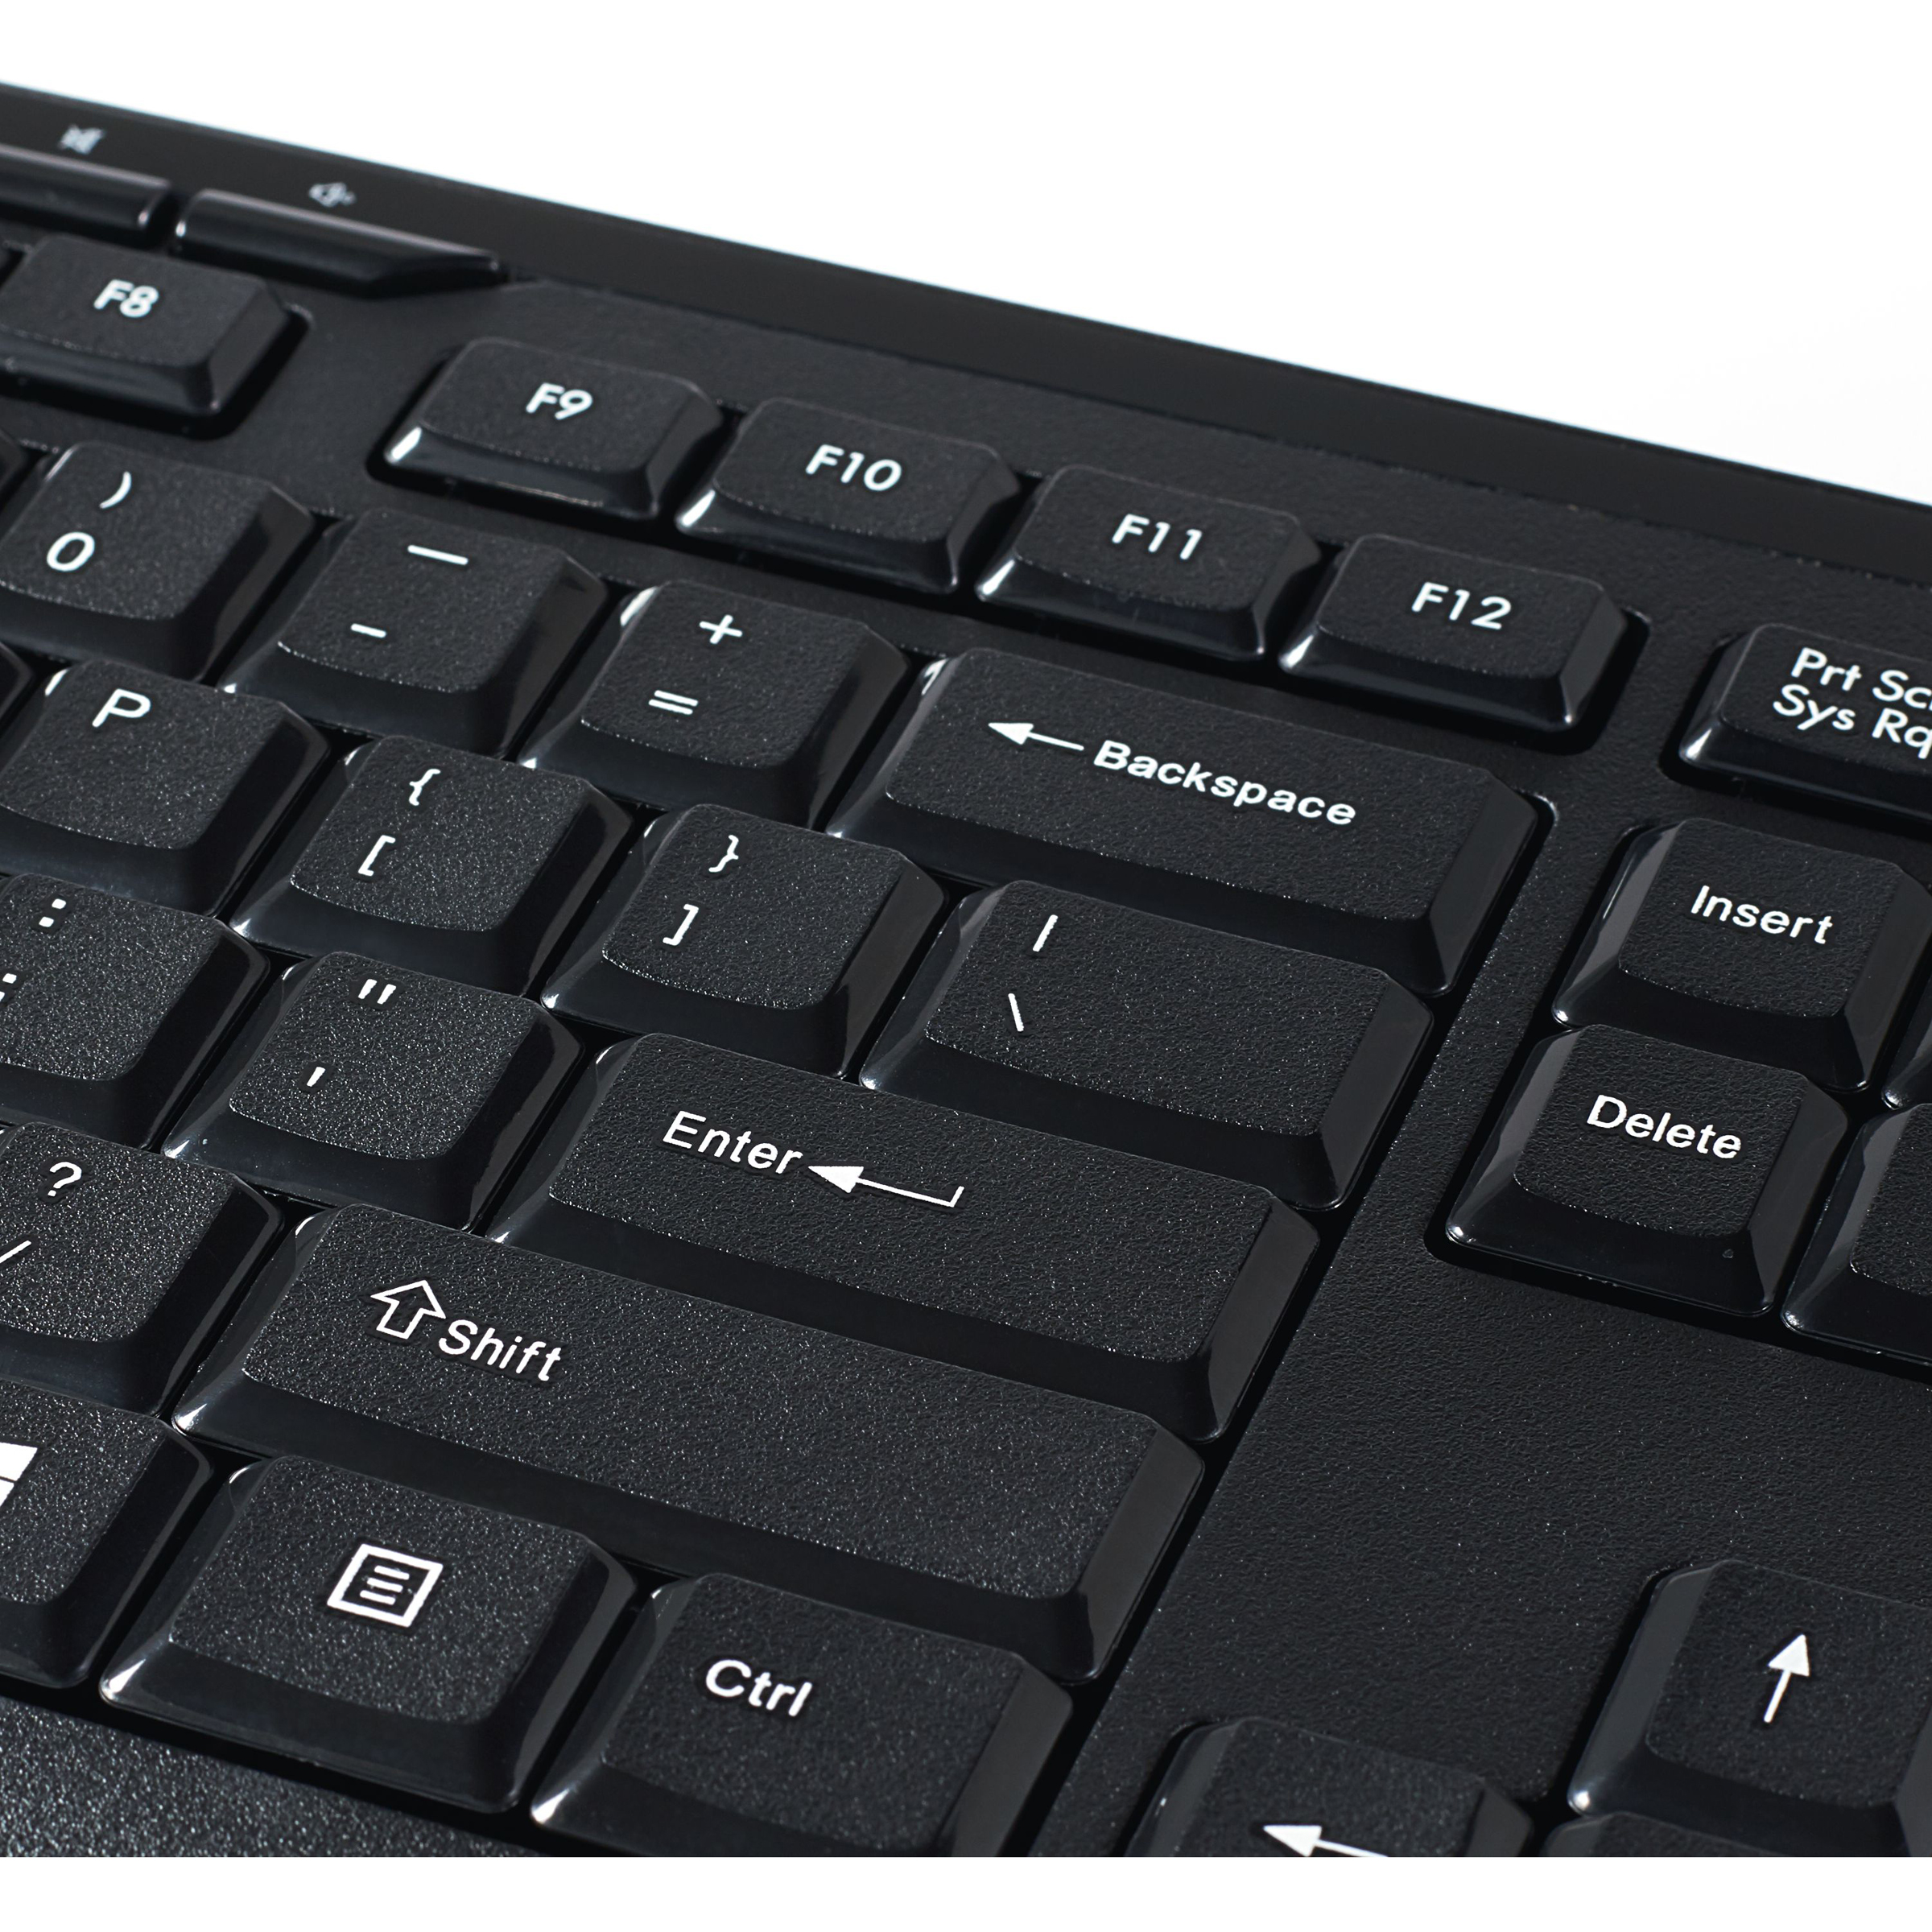 triplenet pricing verbatim silent wireless mouse and keyboard black. Black Bedroom Furniture Sets. Home Design Ideas